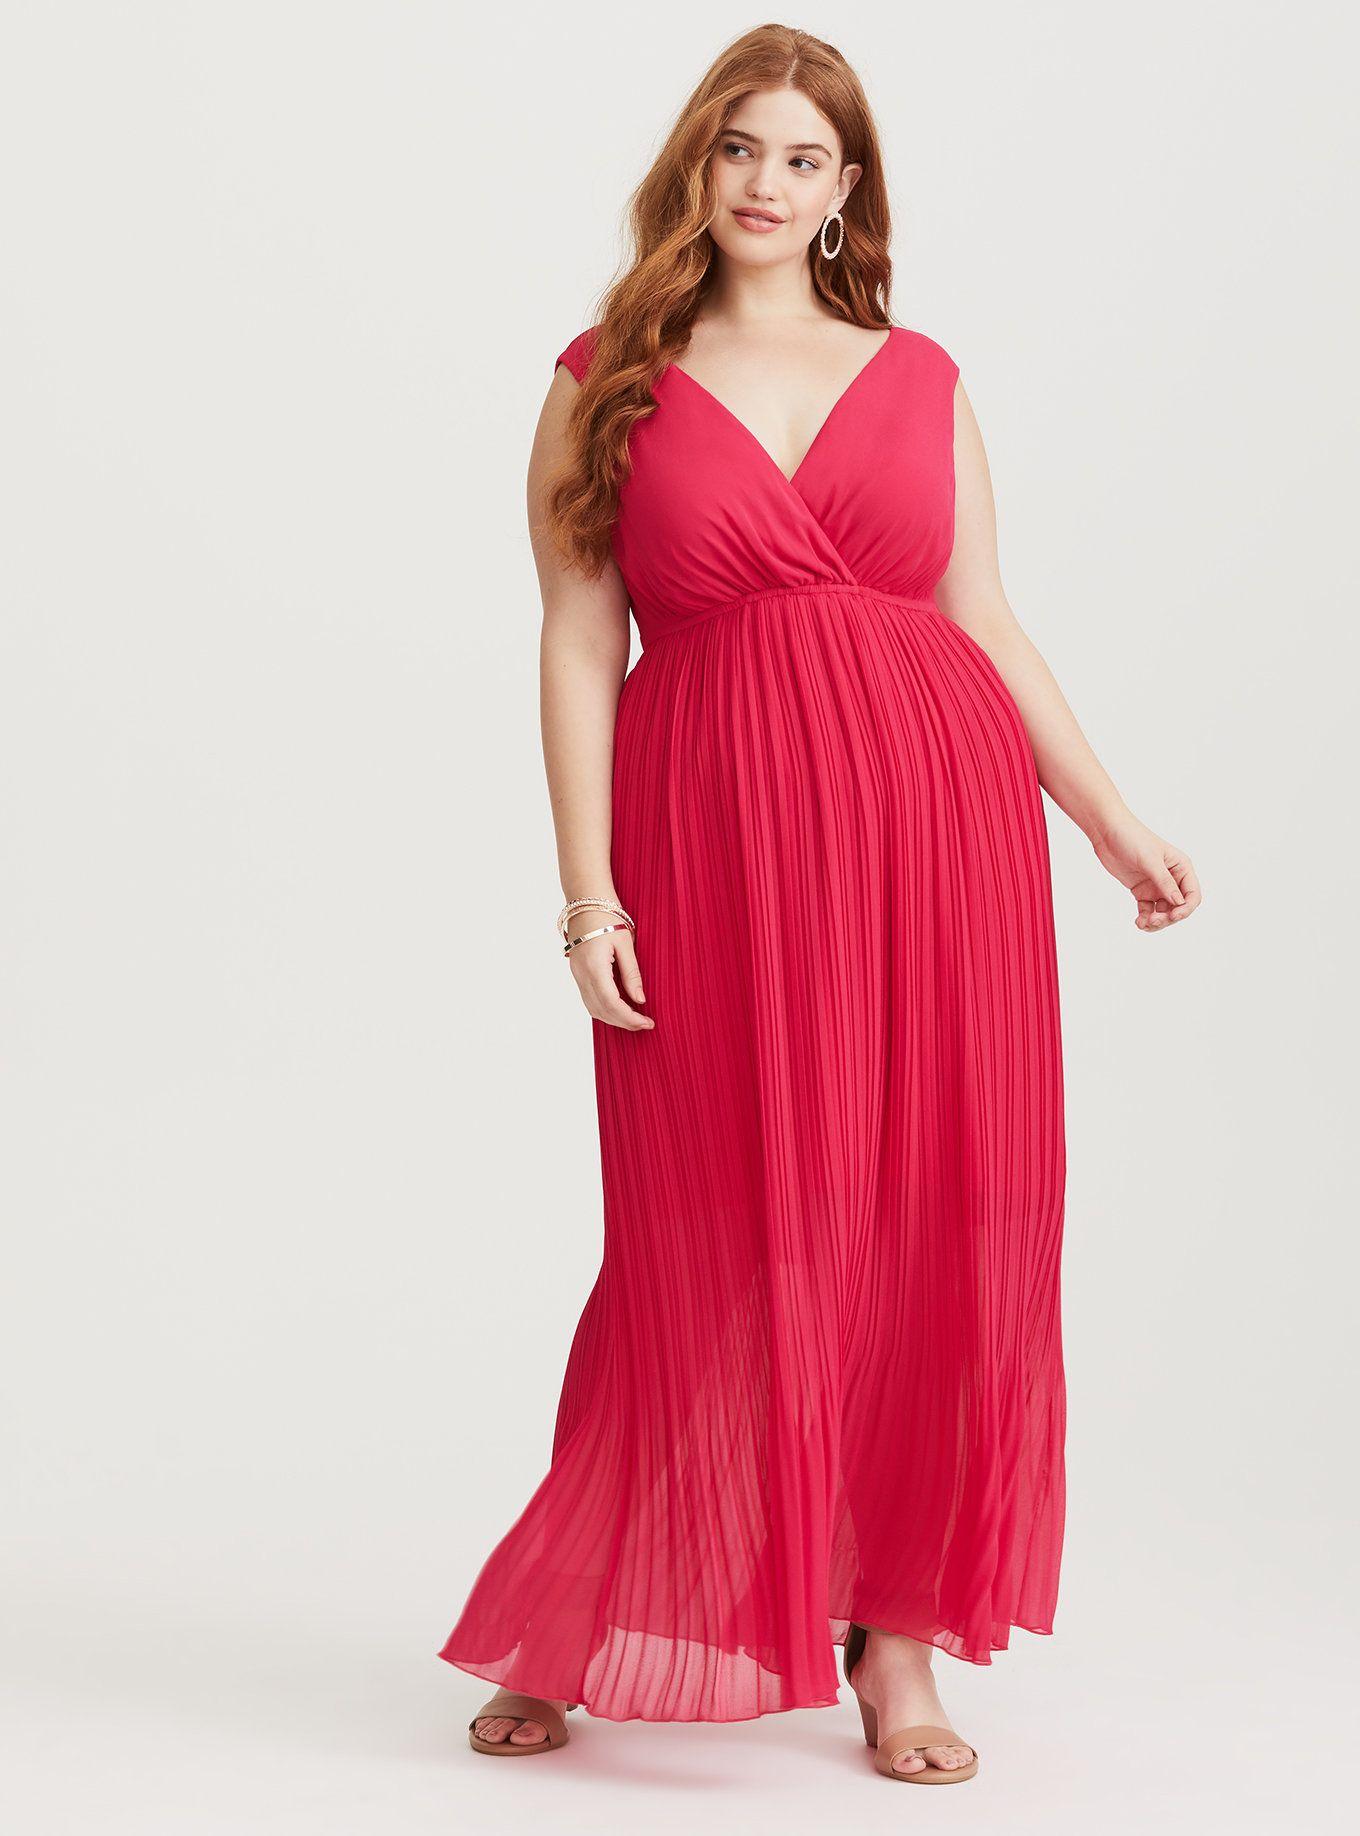 Hot Pink Plus Size Maxi Dress – DACC